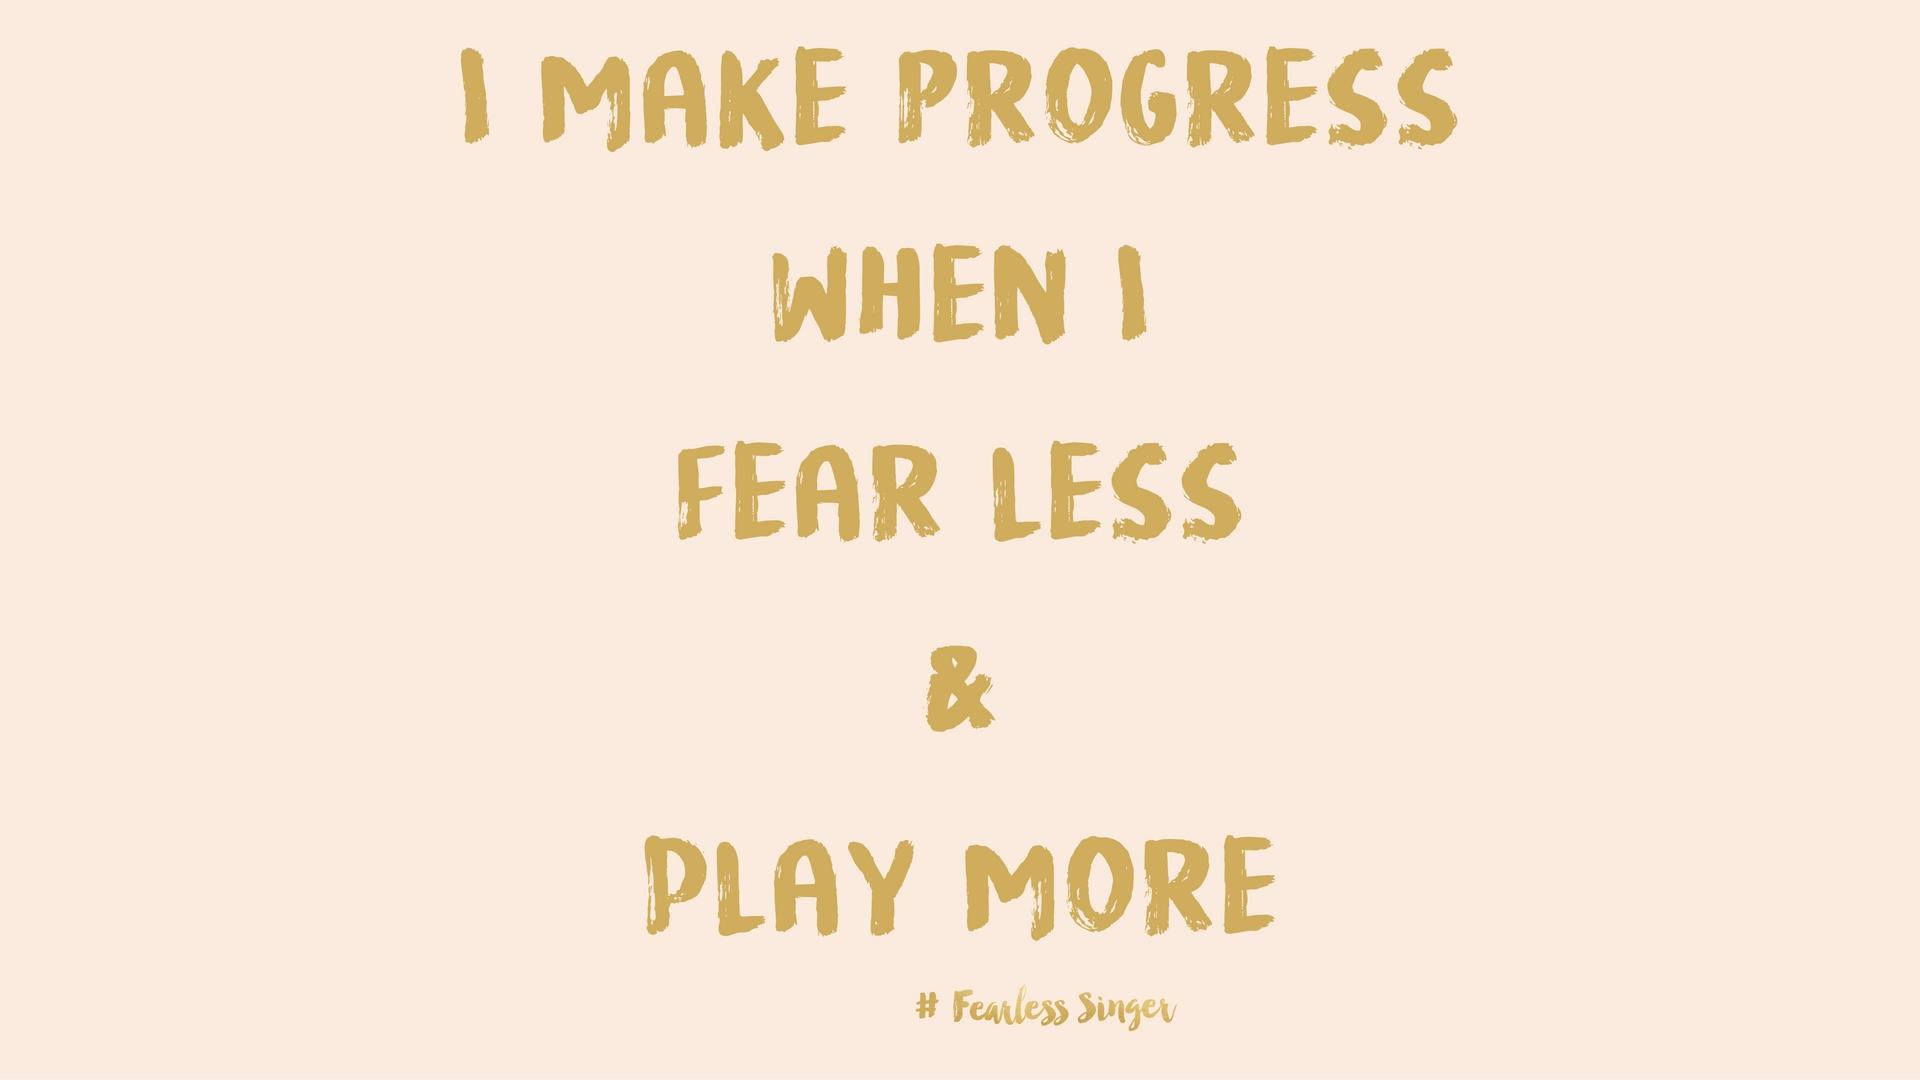 fearlessplaymore